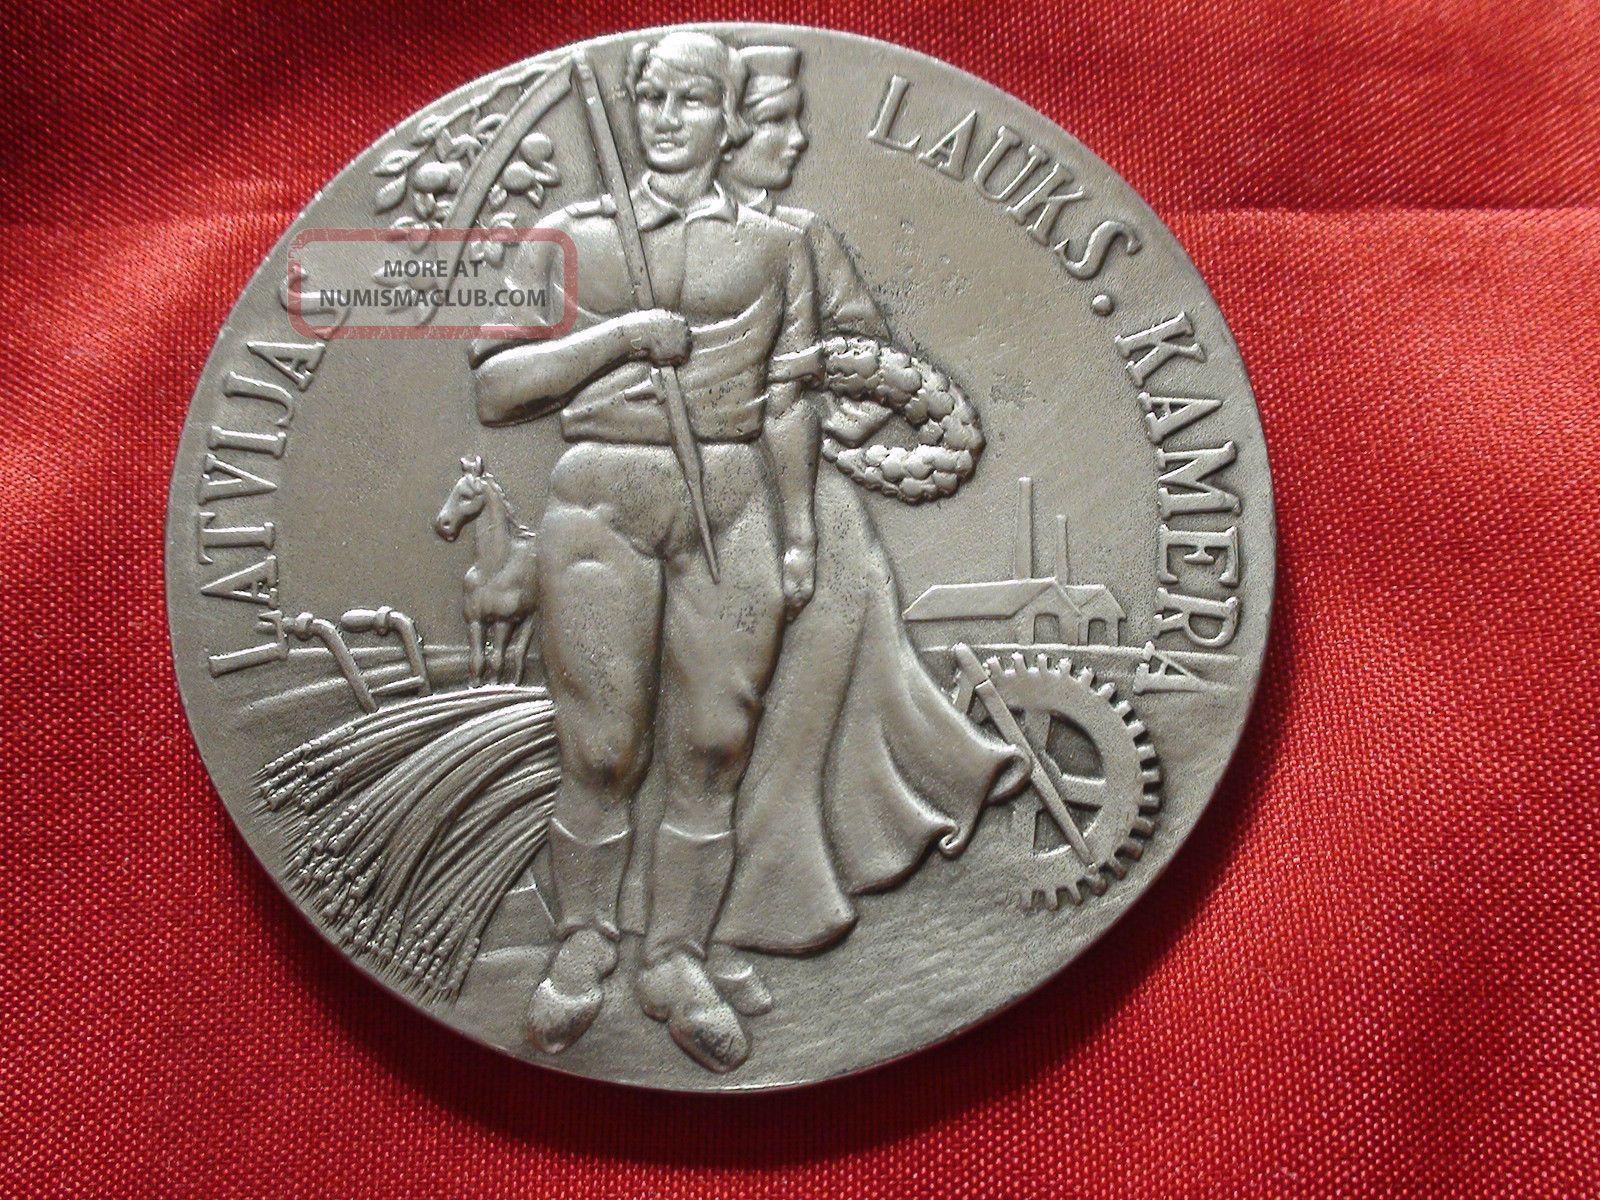 Supper Rare Medal Latvijas LauksmniecĪbas Kamera 1925 - 1929 Years Exonumia photo